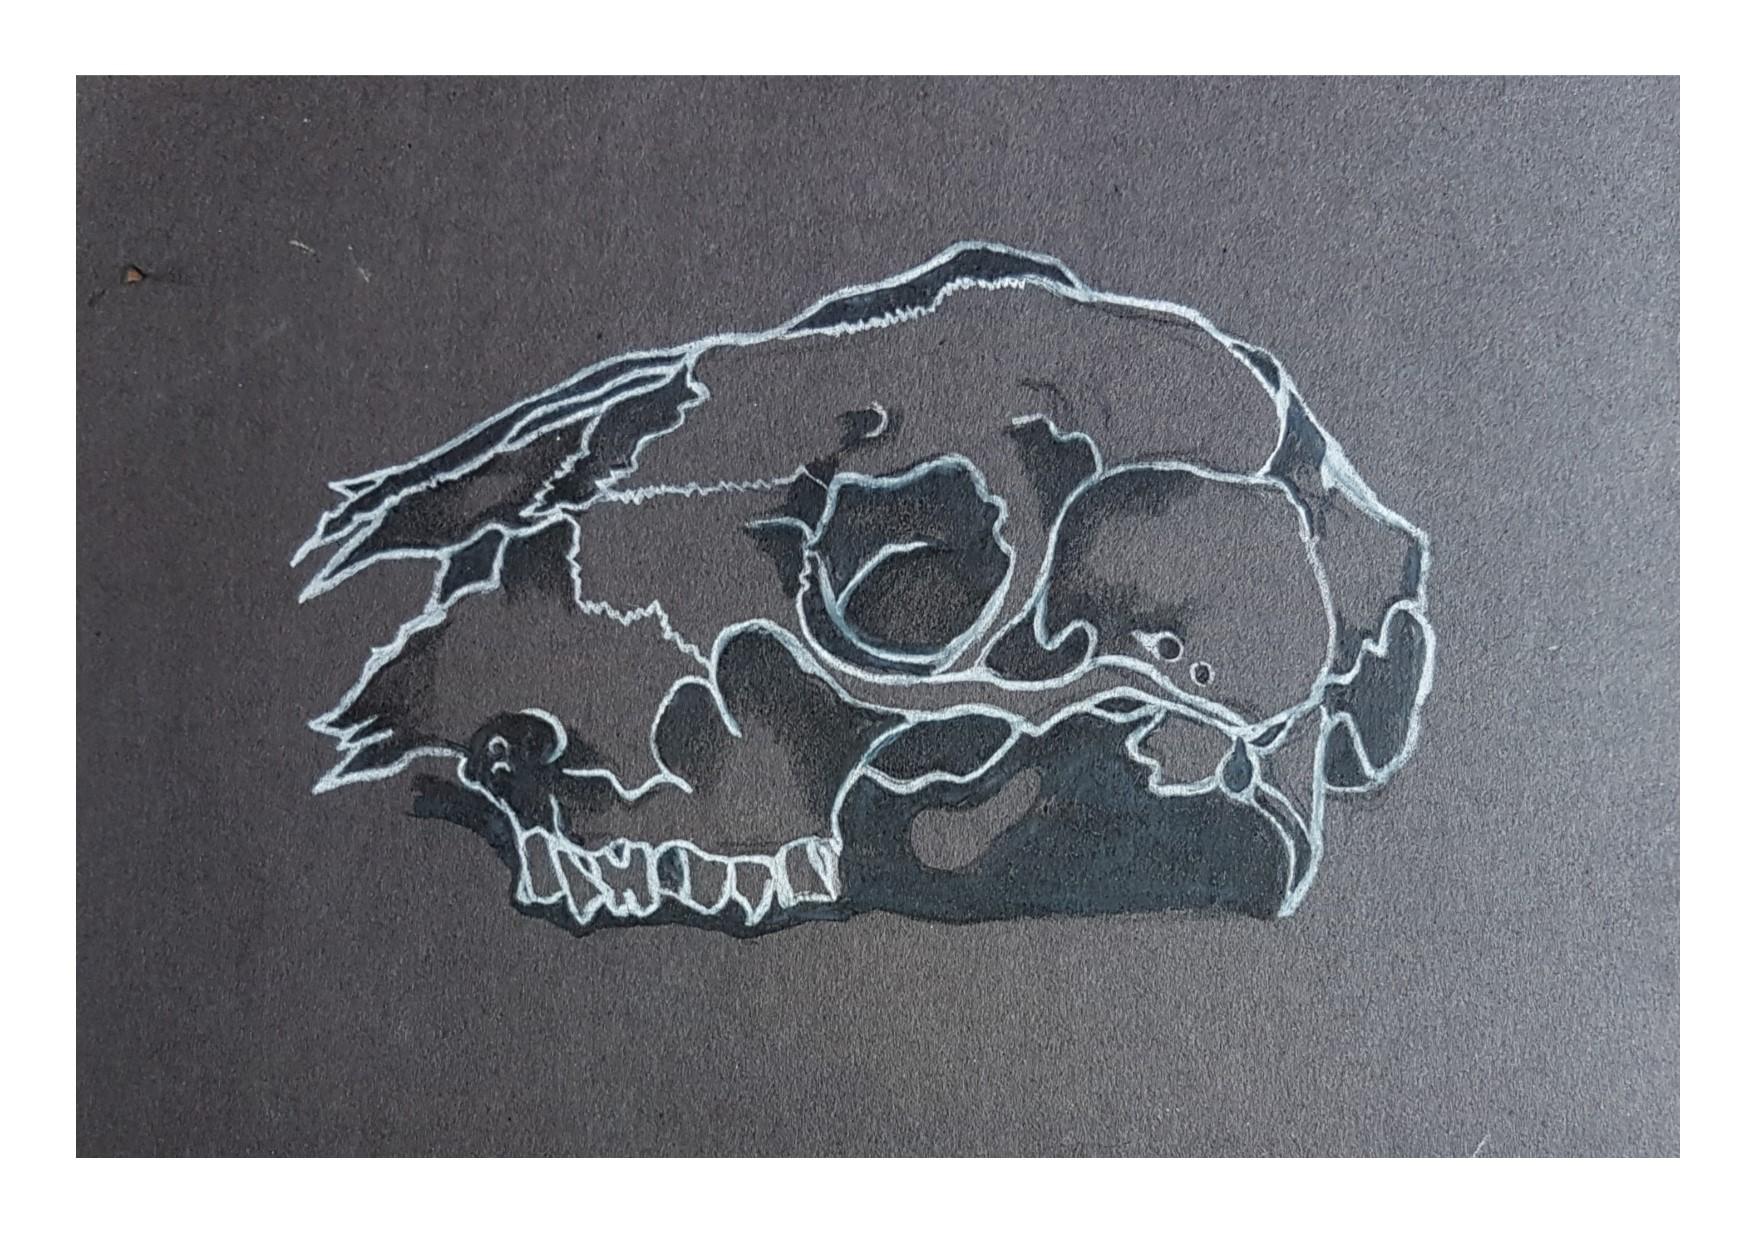 monochrome sheeps skull black and white pencil on black paper